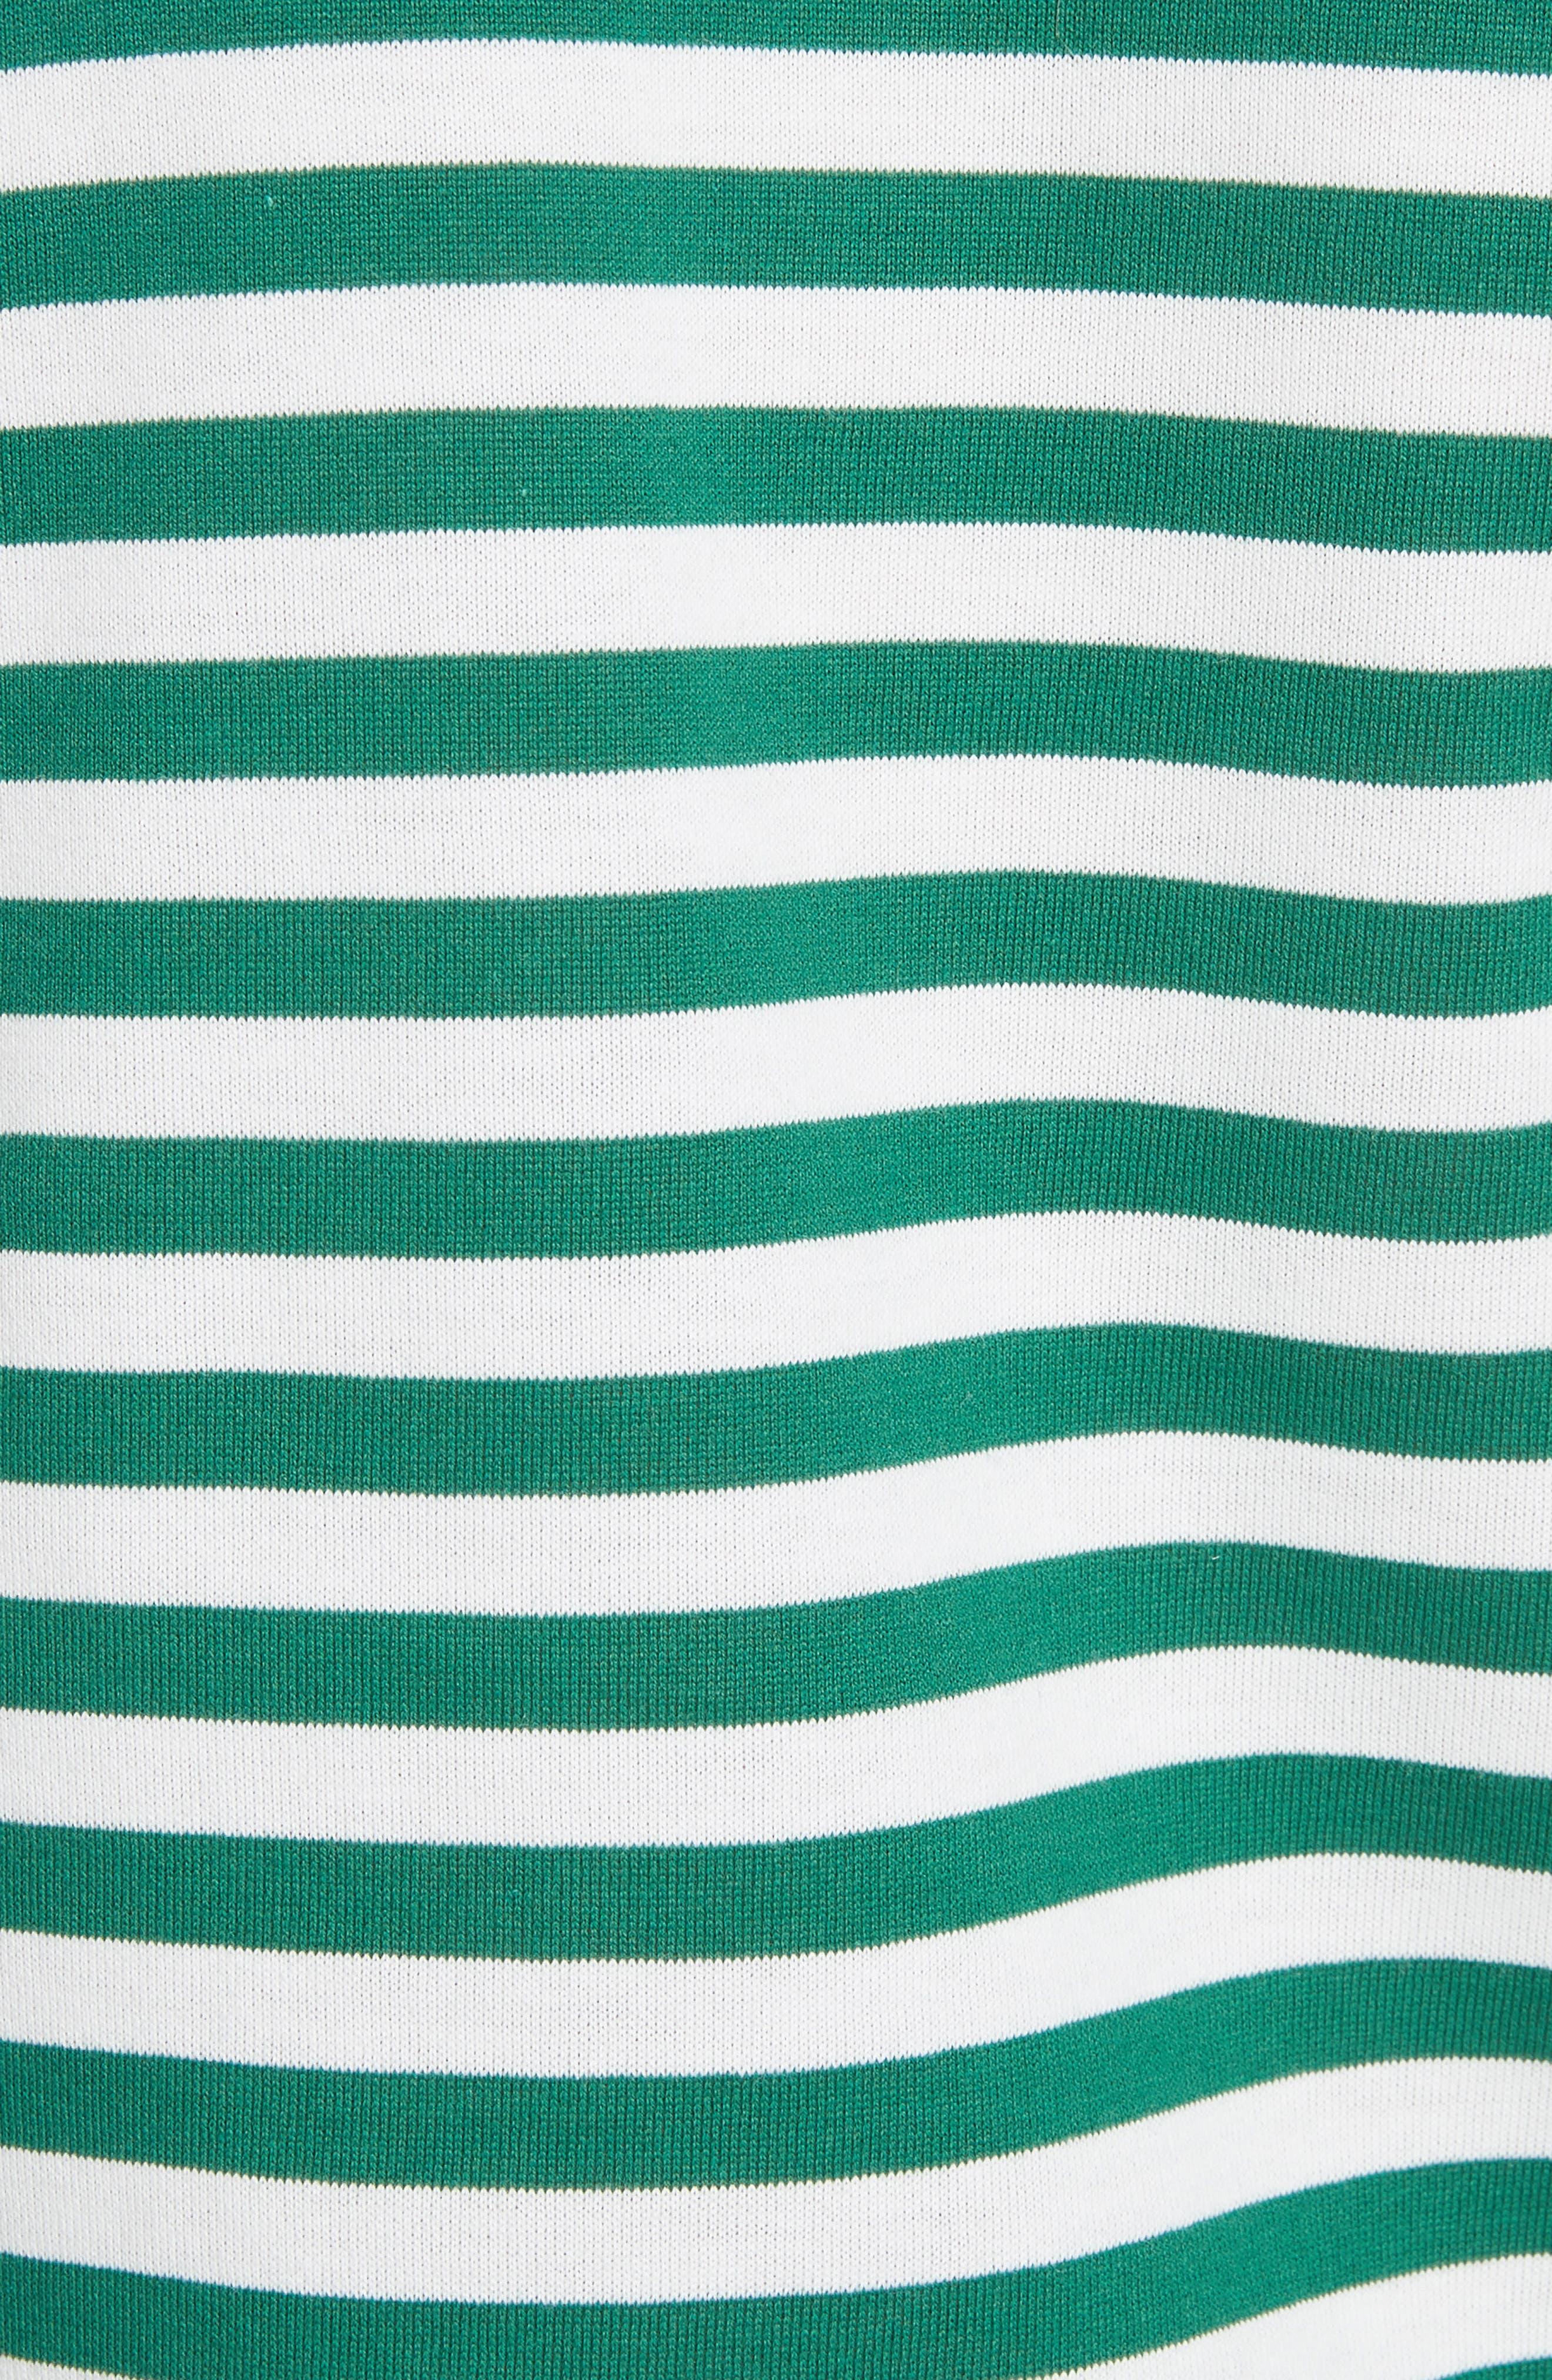 Comme des Garçons PLAY Stripe Cotton Tee,                             Alternate thumbnail 5, color,                             GREEN/ WHITE